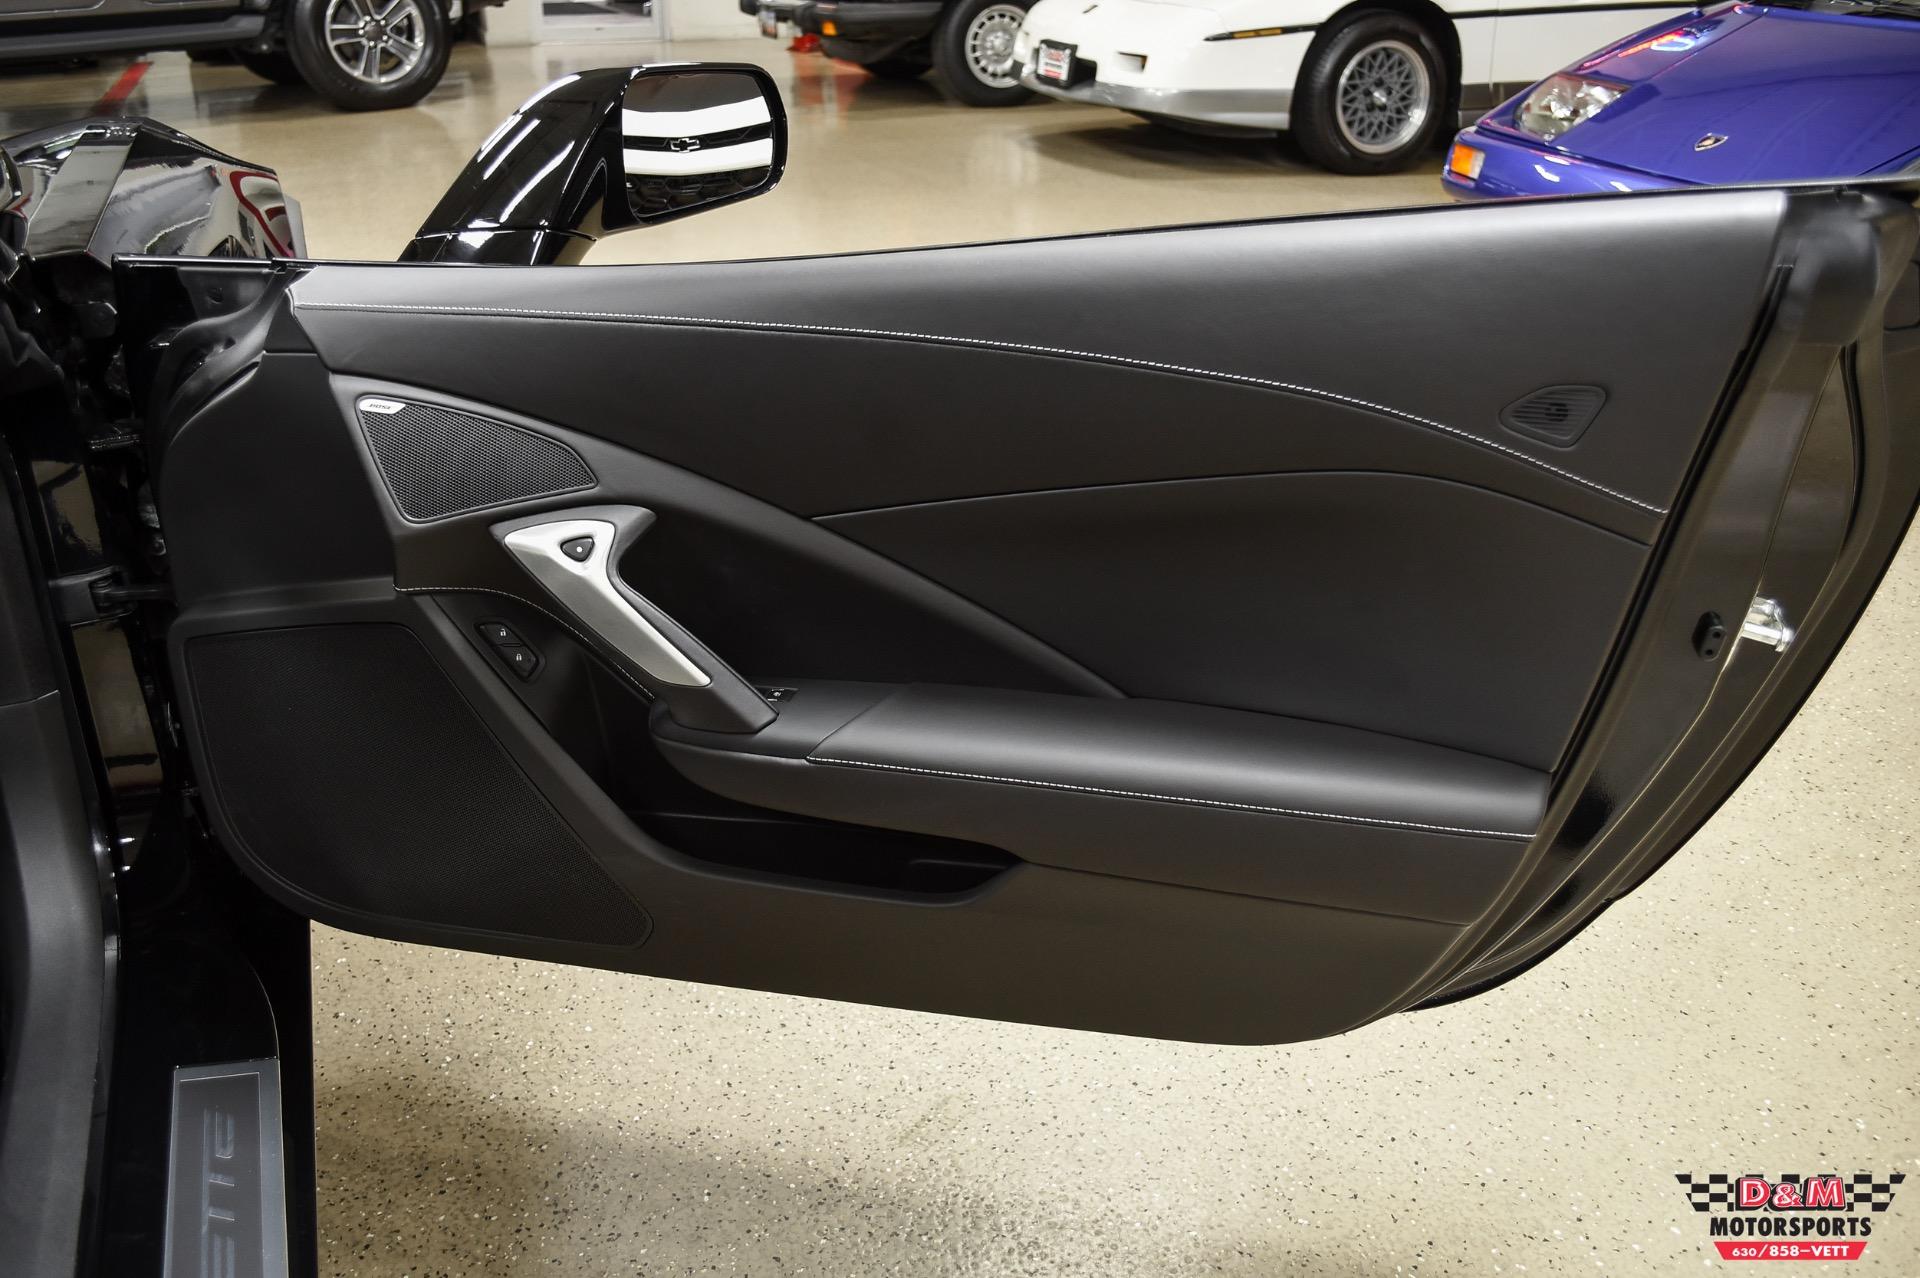 Used 2016 Chevrolet Corvette Z06 Convertible   Glen Ellyn, IL